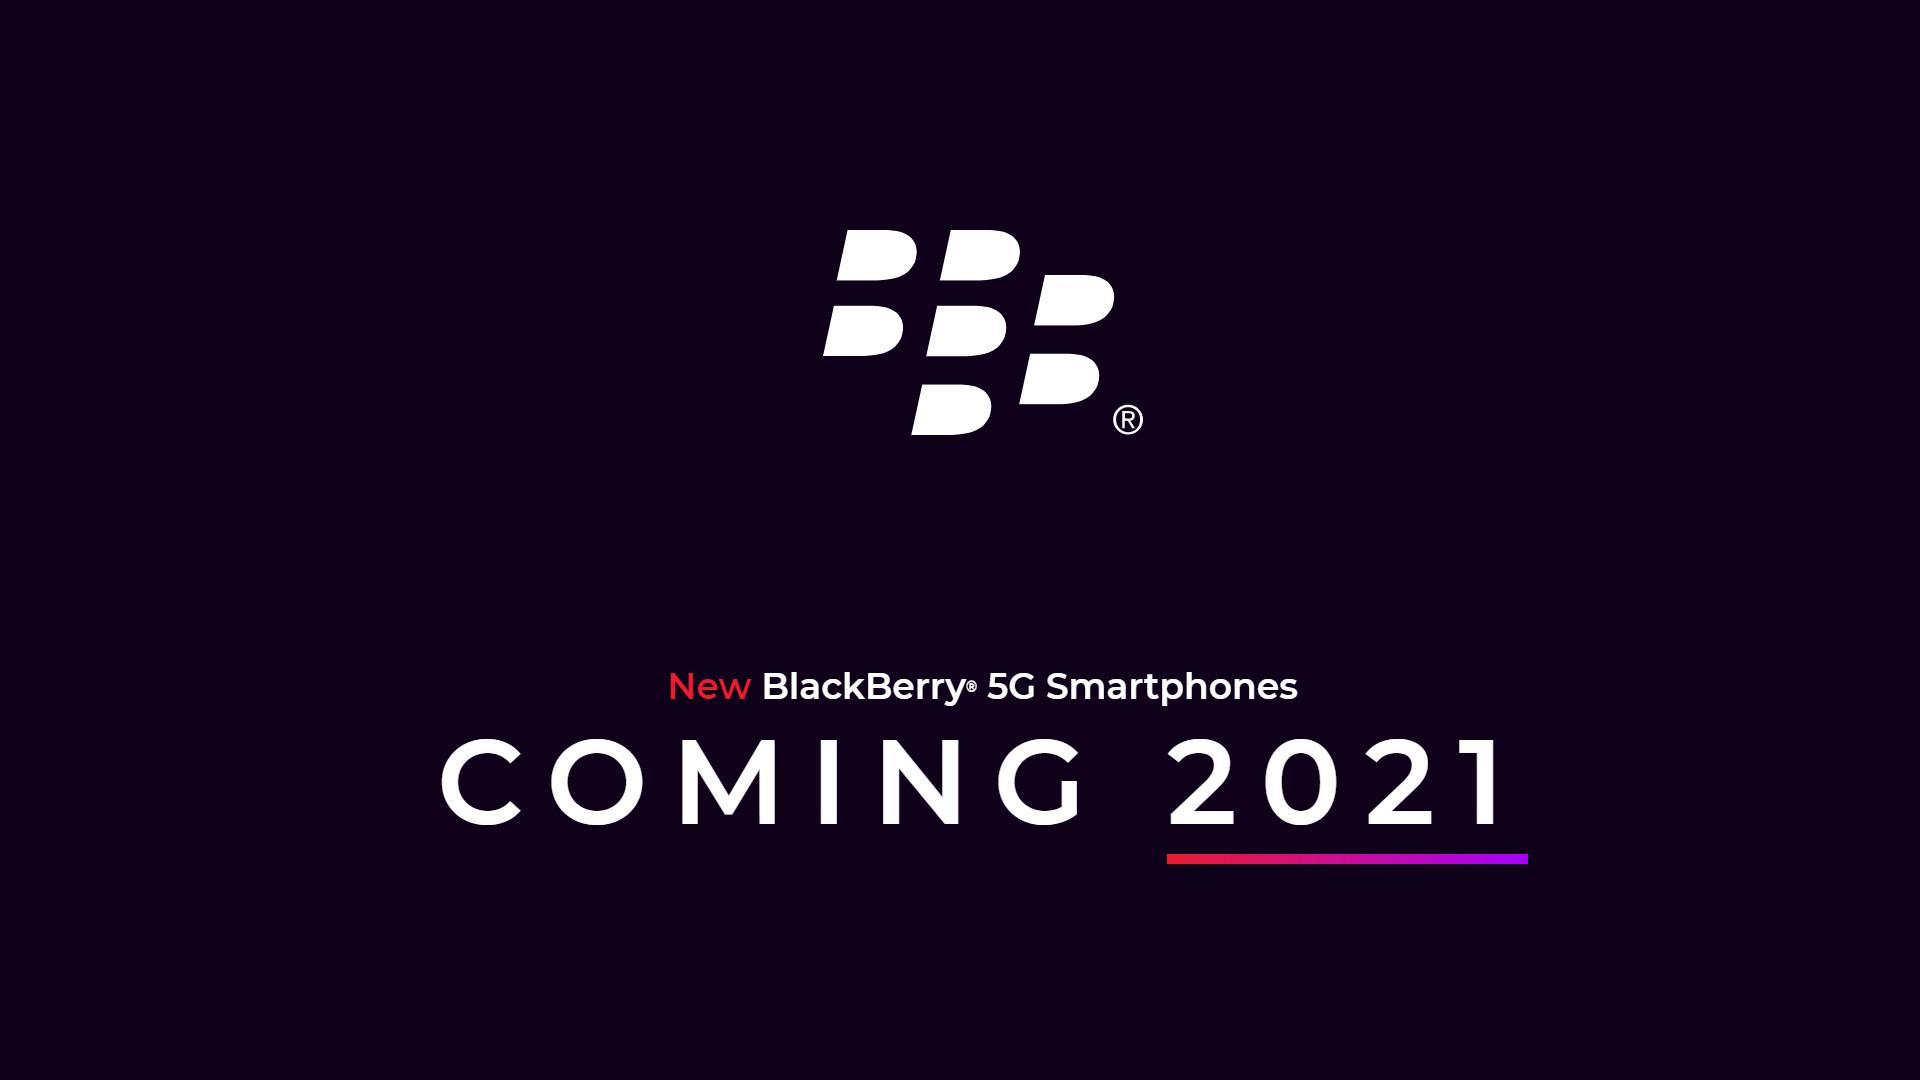 BlackBerry 5G smartphones Onward Mobility